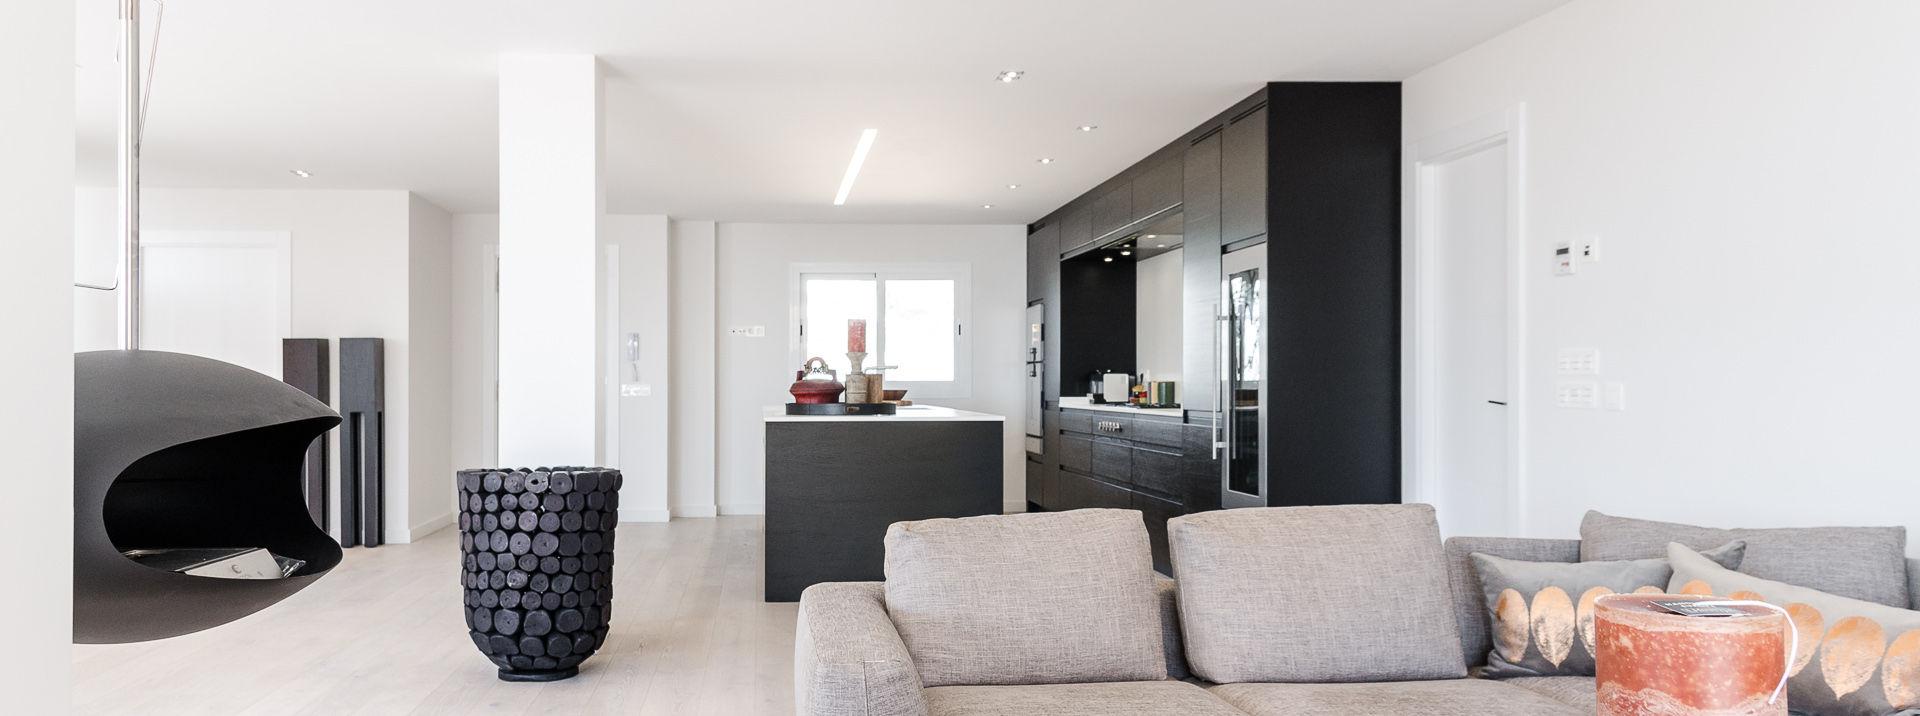 Nordic Muebles - Kitchens - Modern - Palma